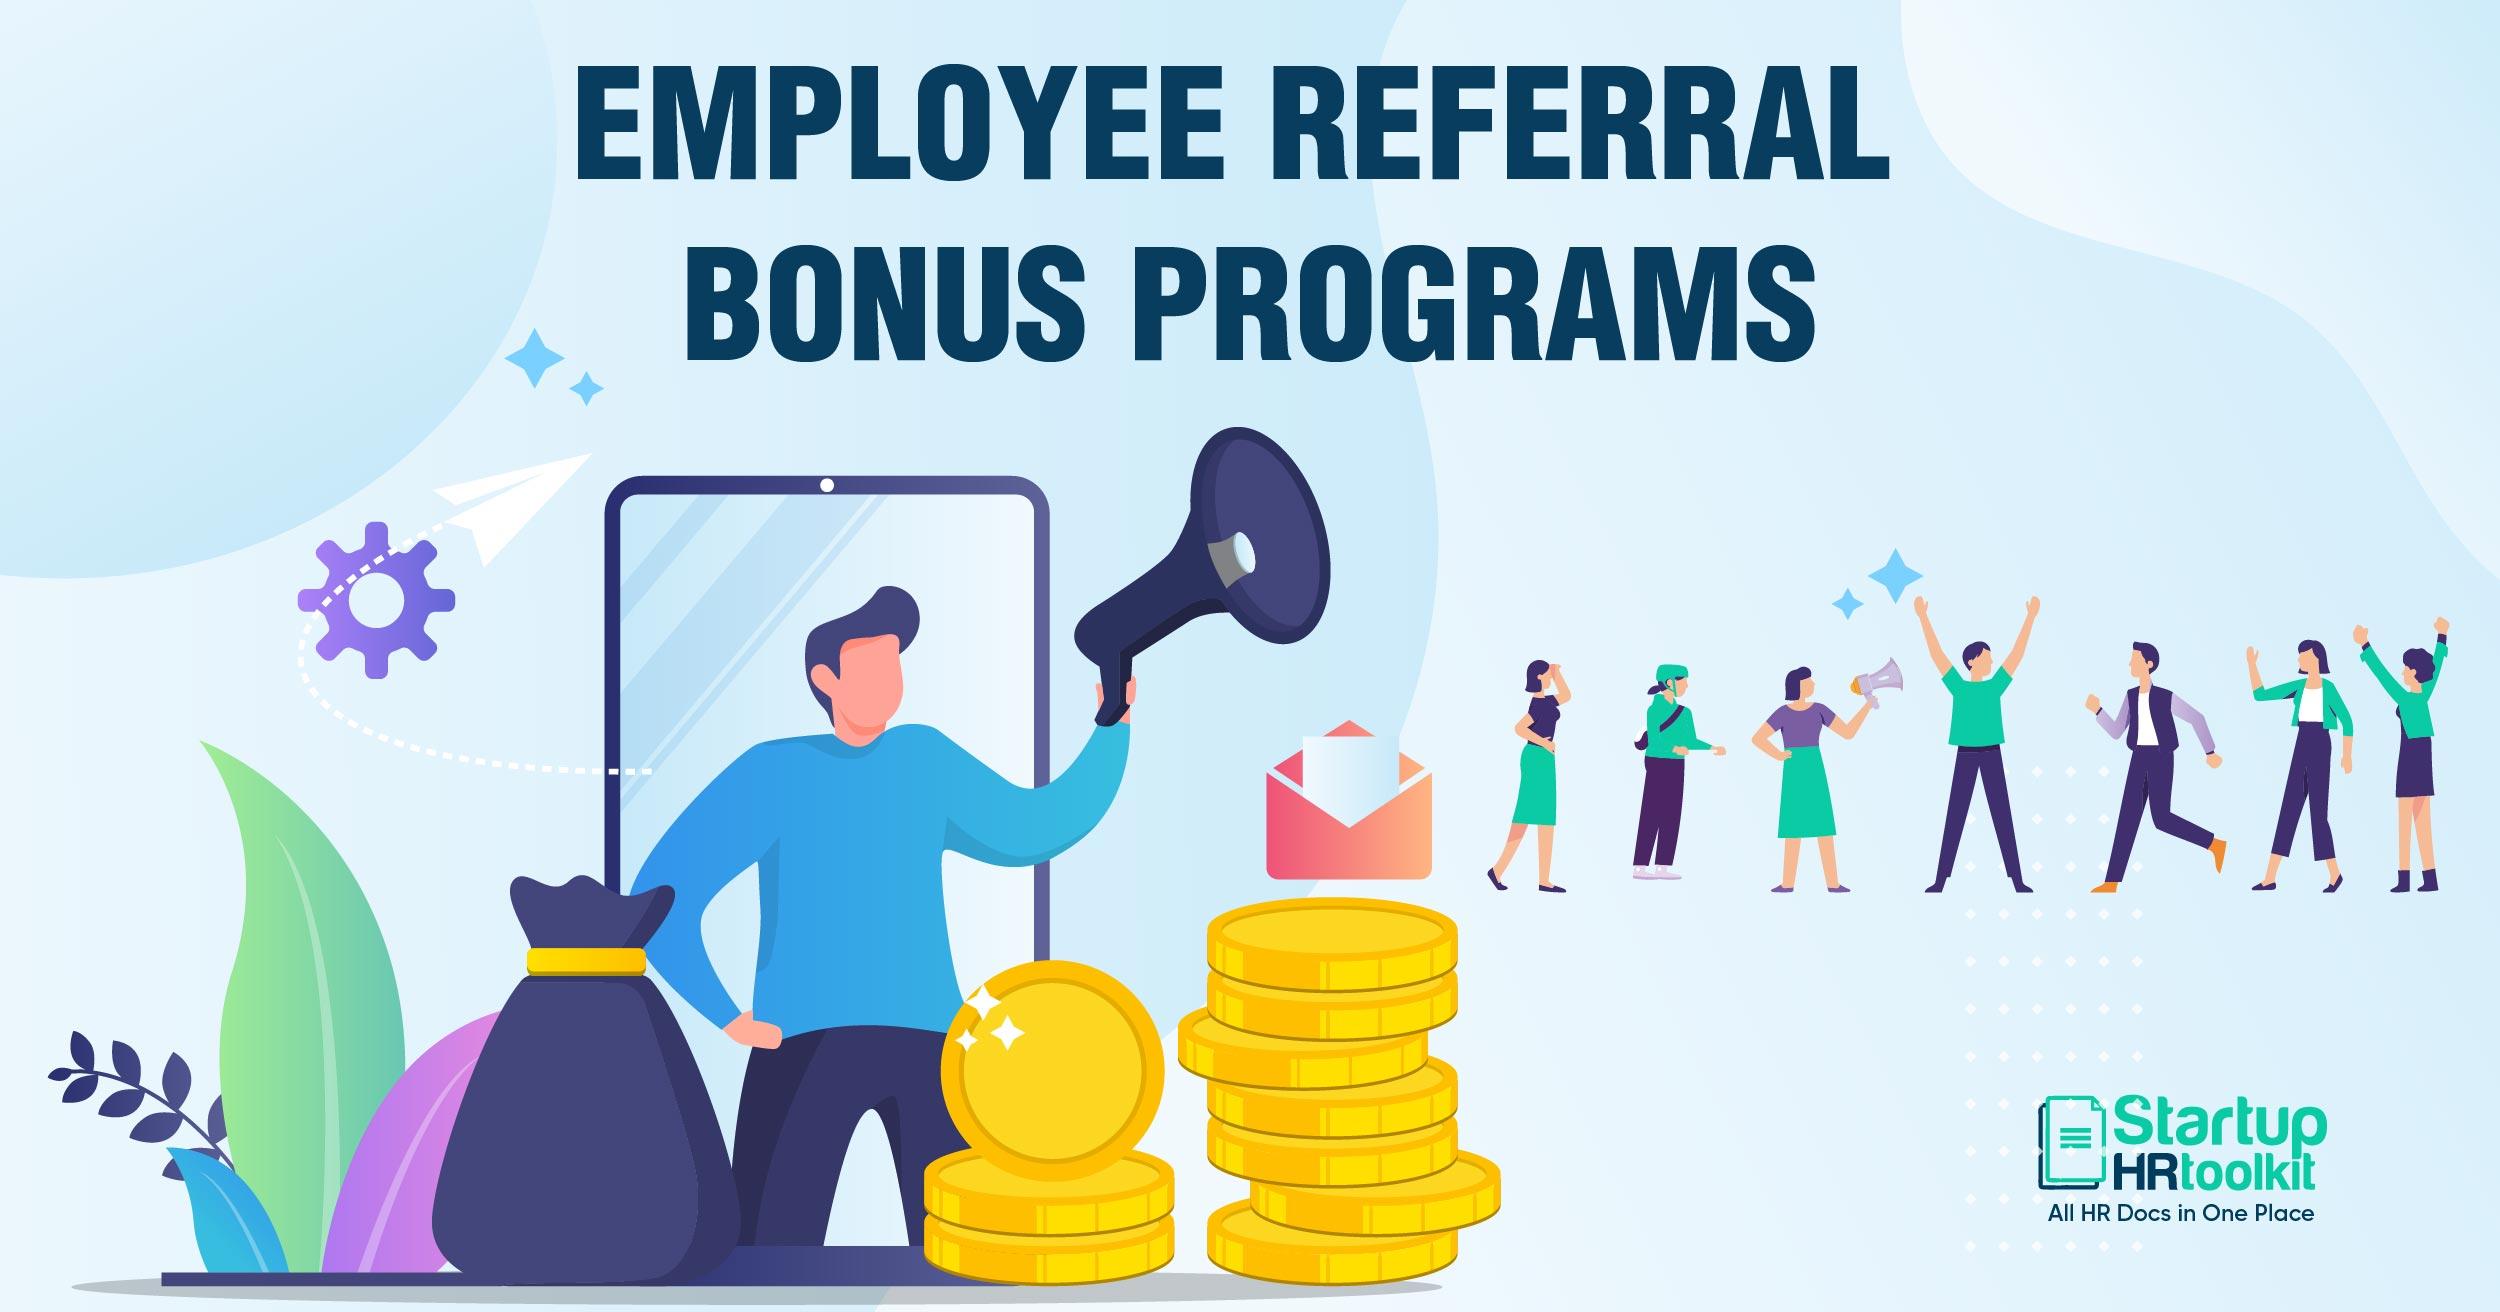 15 Creative Ideas For Employee Referral Bonus Programs